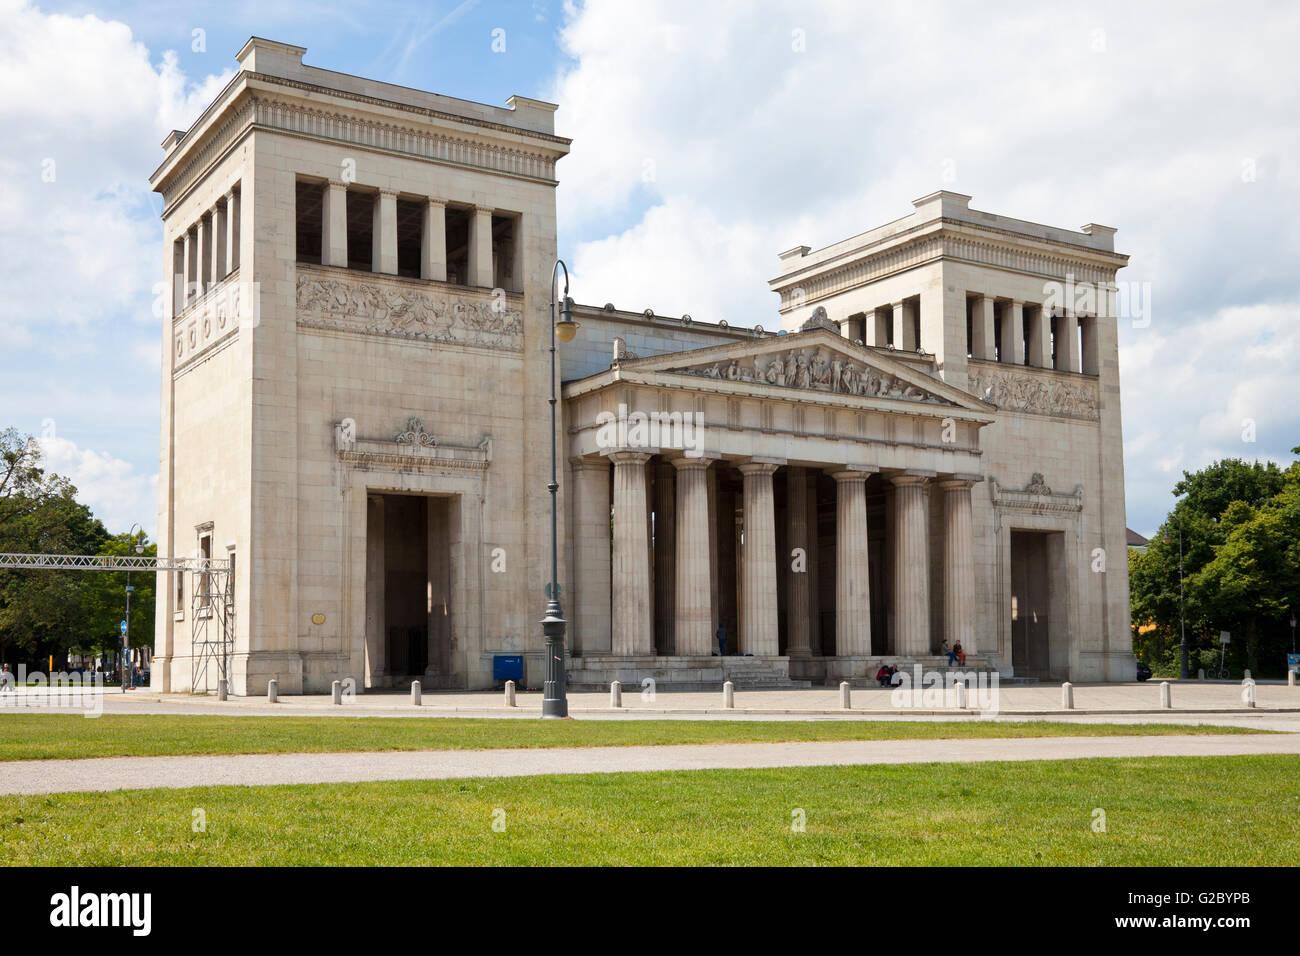 Propylaea Museum on Koenigsplatz square, München, Bavaria, Germany - Stock Image